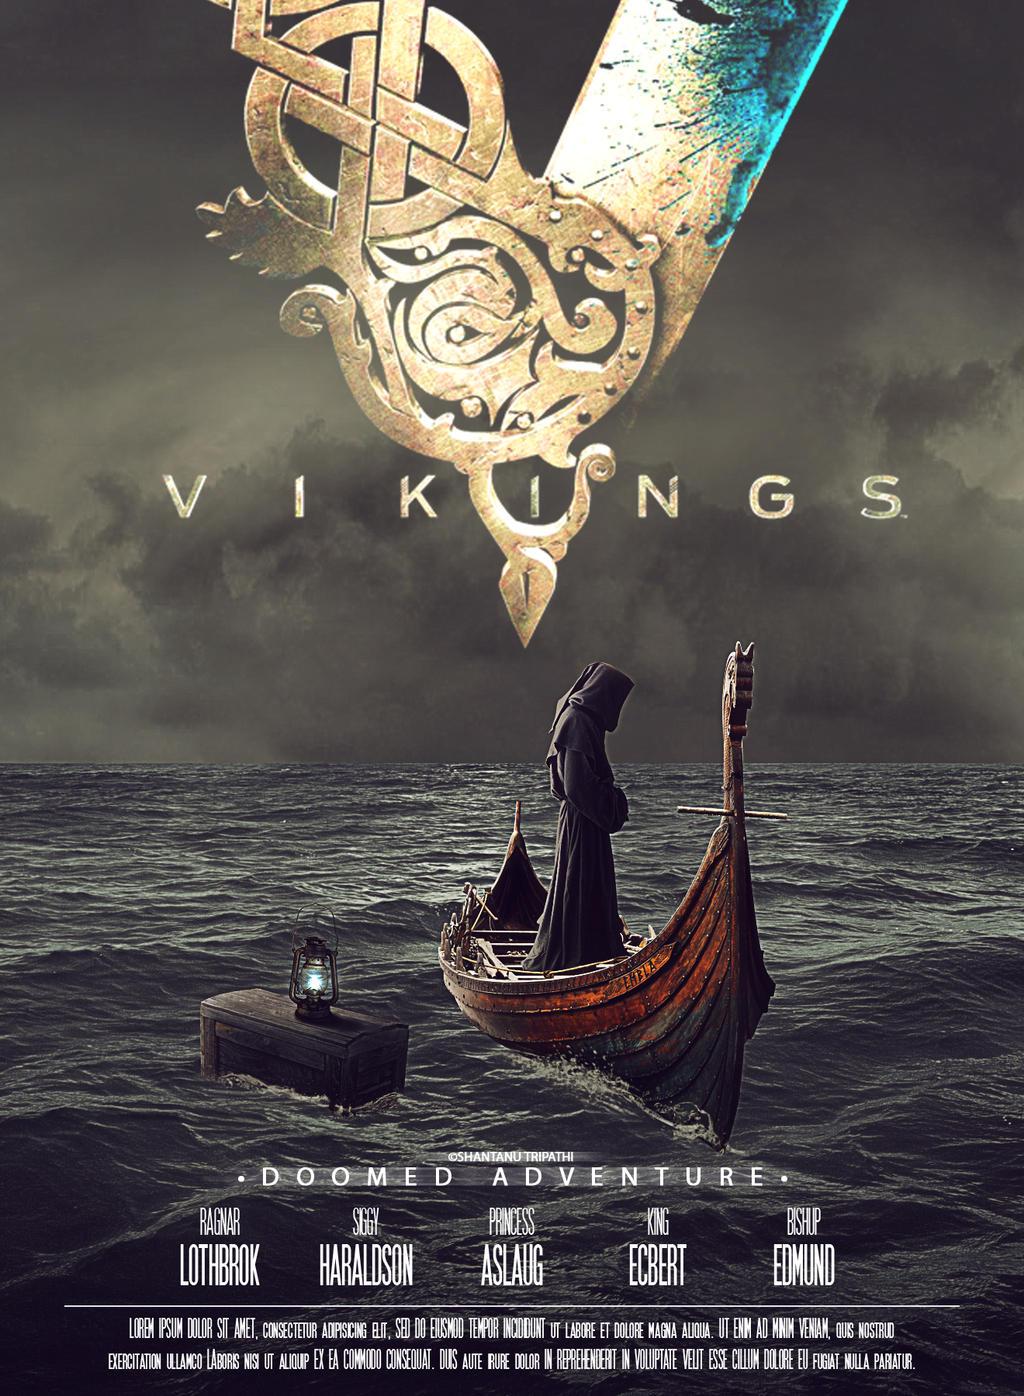 Vikings Movie Poster by DaShaan on DeviantArt